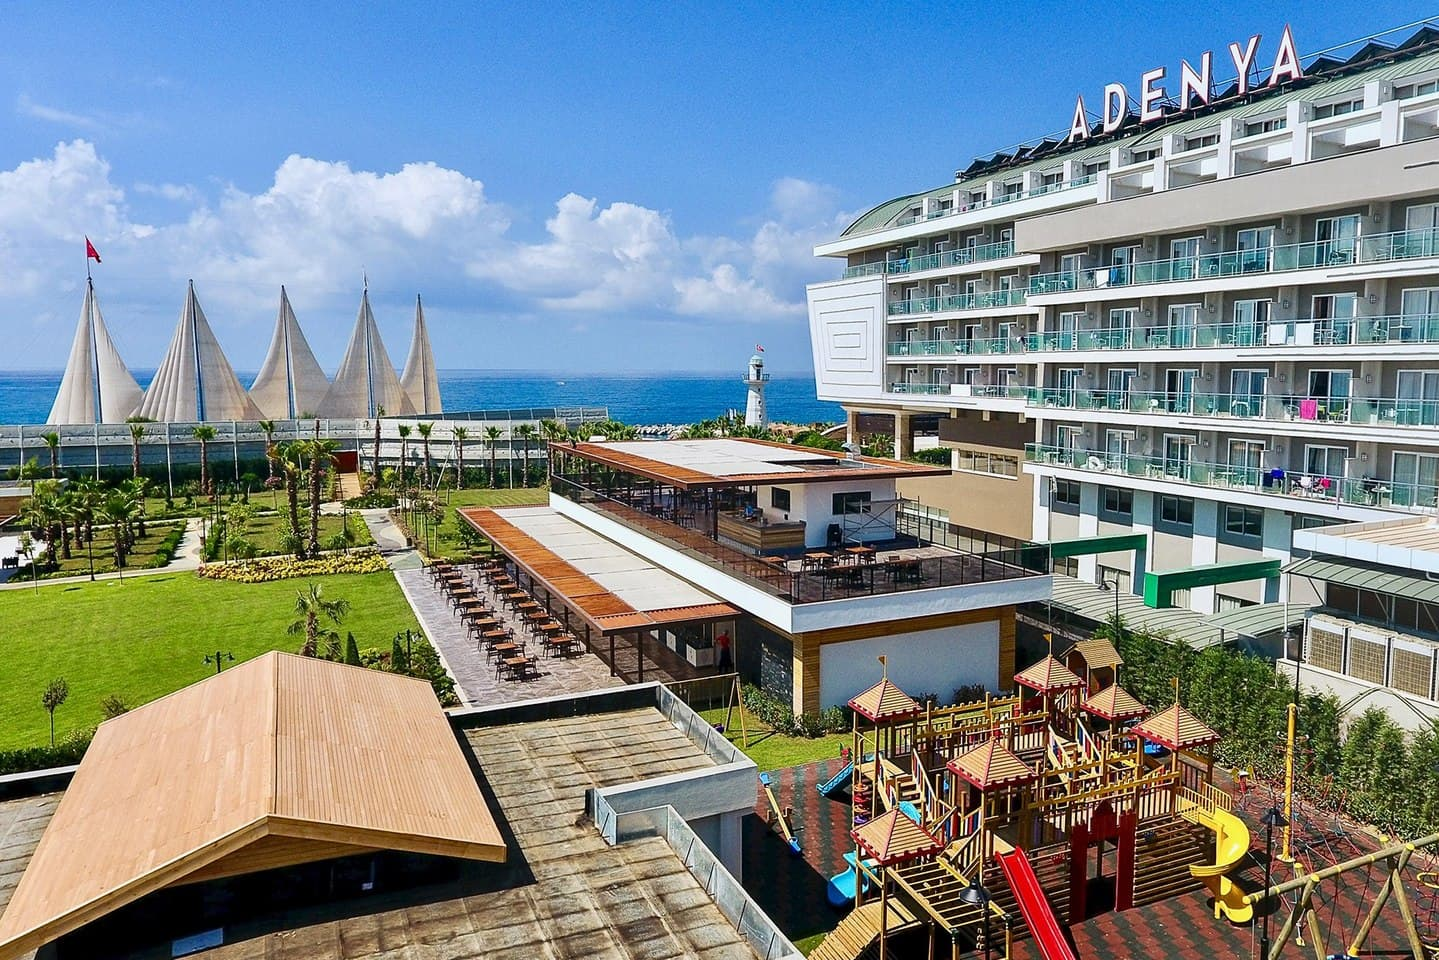 Adenya Hotel & Resort 5*,  Antalya, Turquie